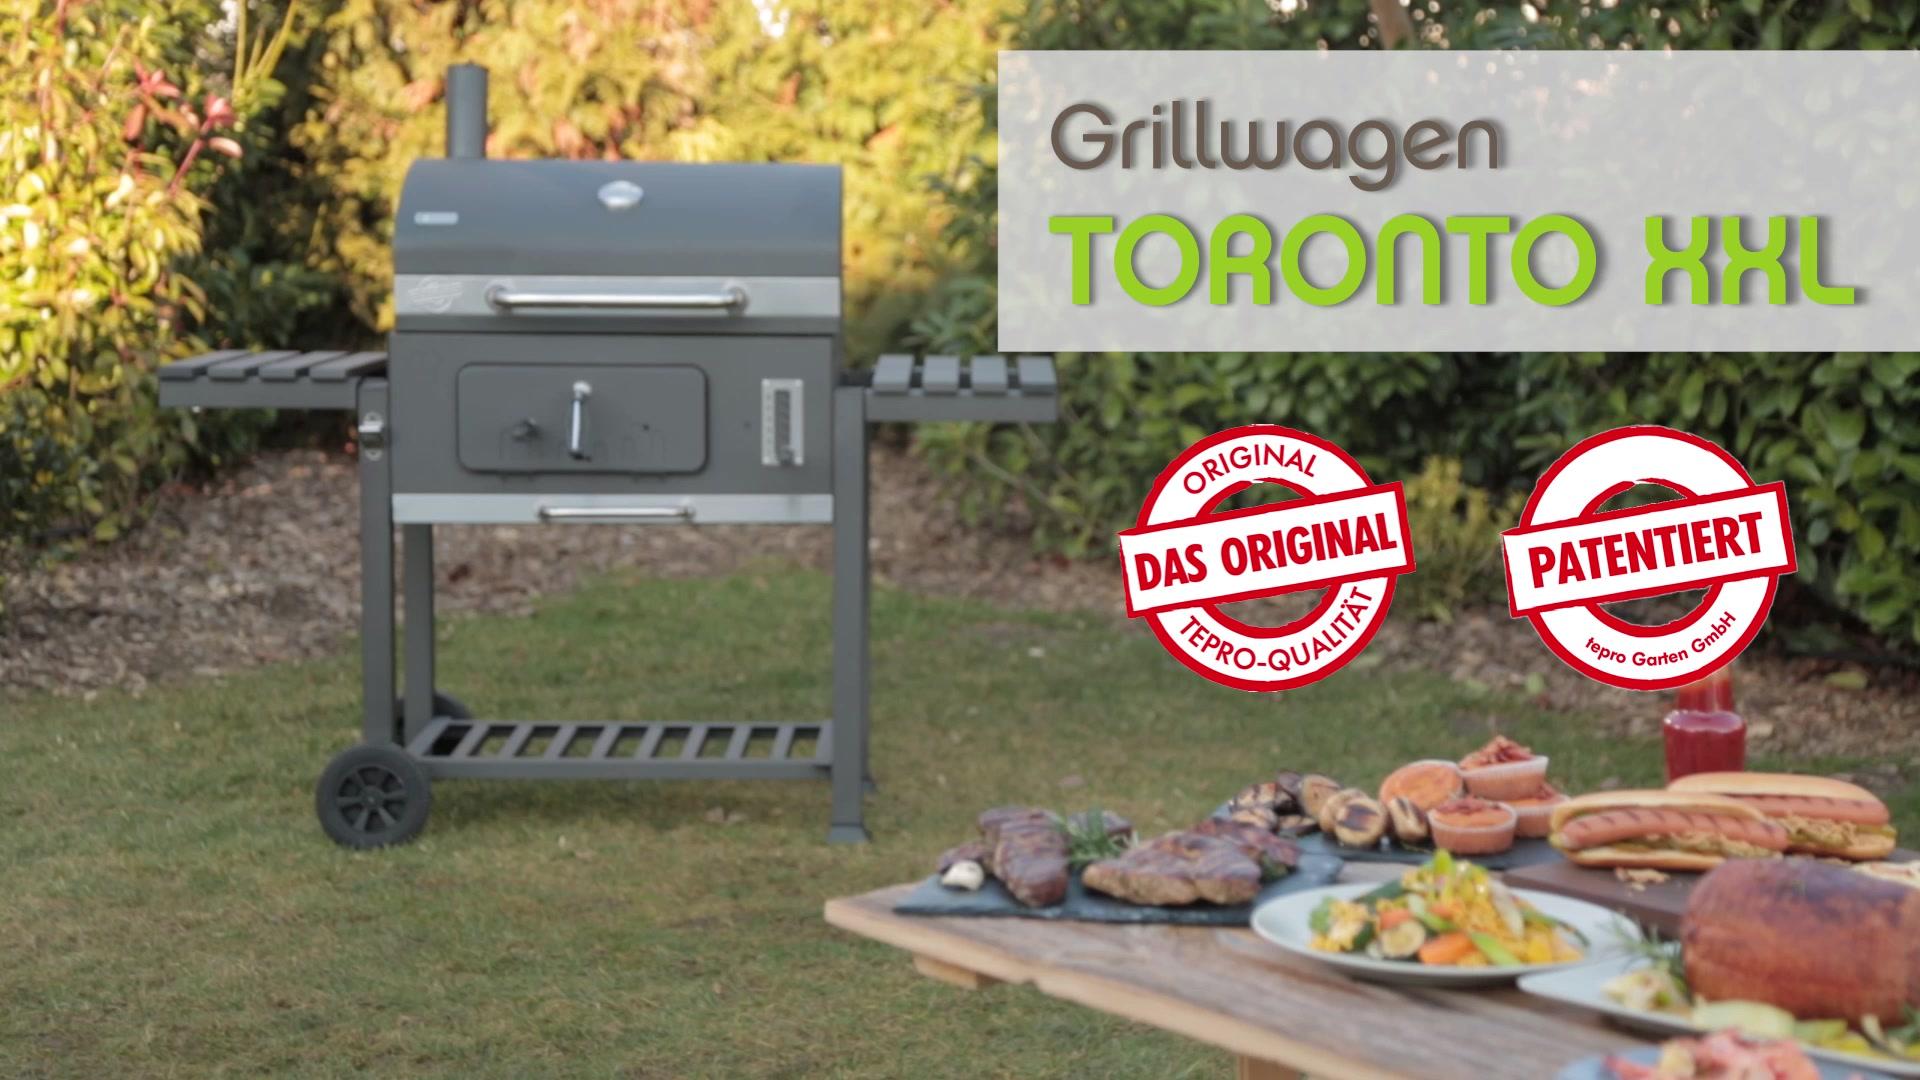 Tepro Toronto Holzkohlegrill Hagebau : Tepro grillwagen »toronto xxl« hagebau.de